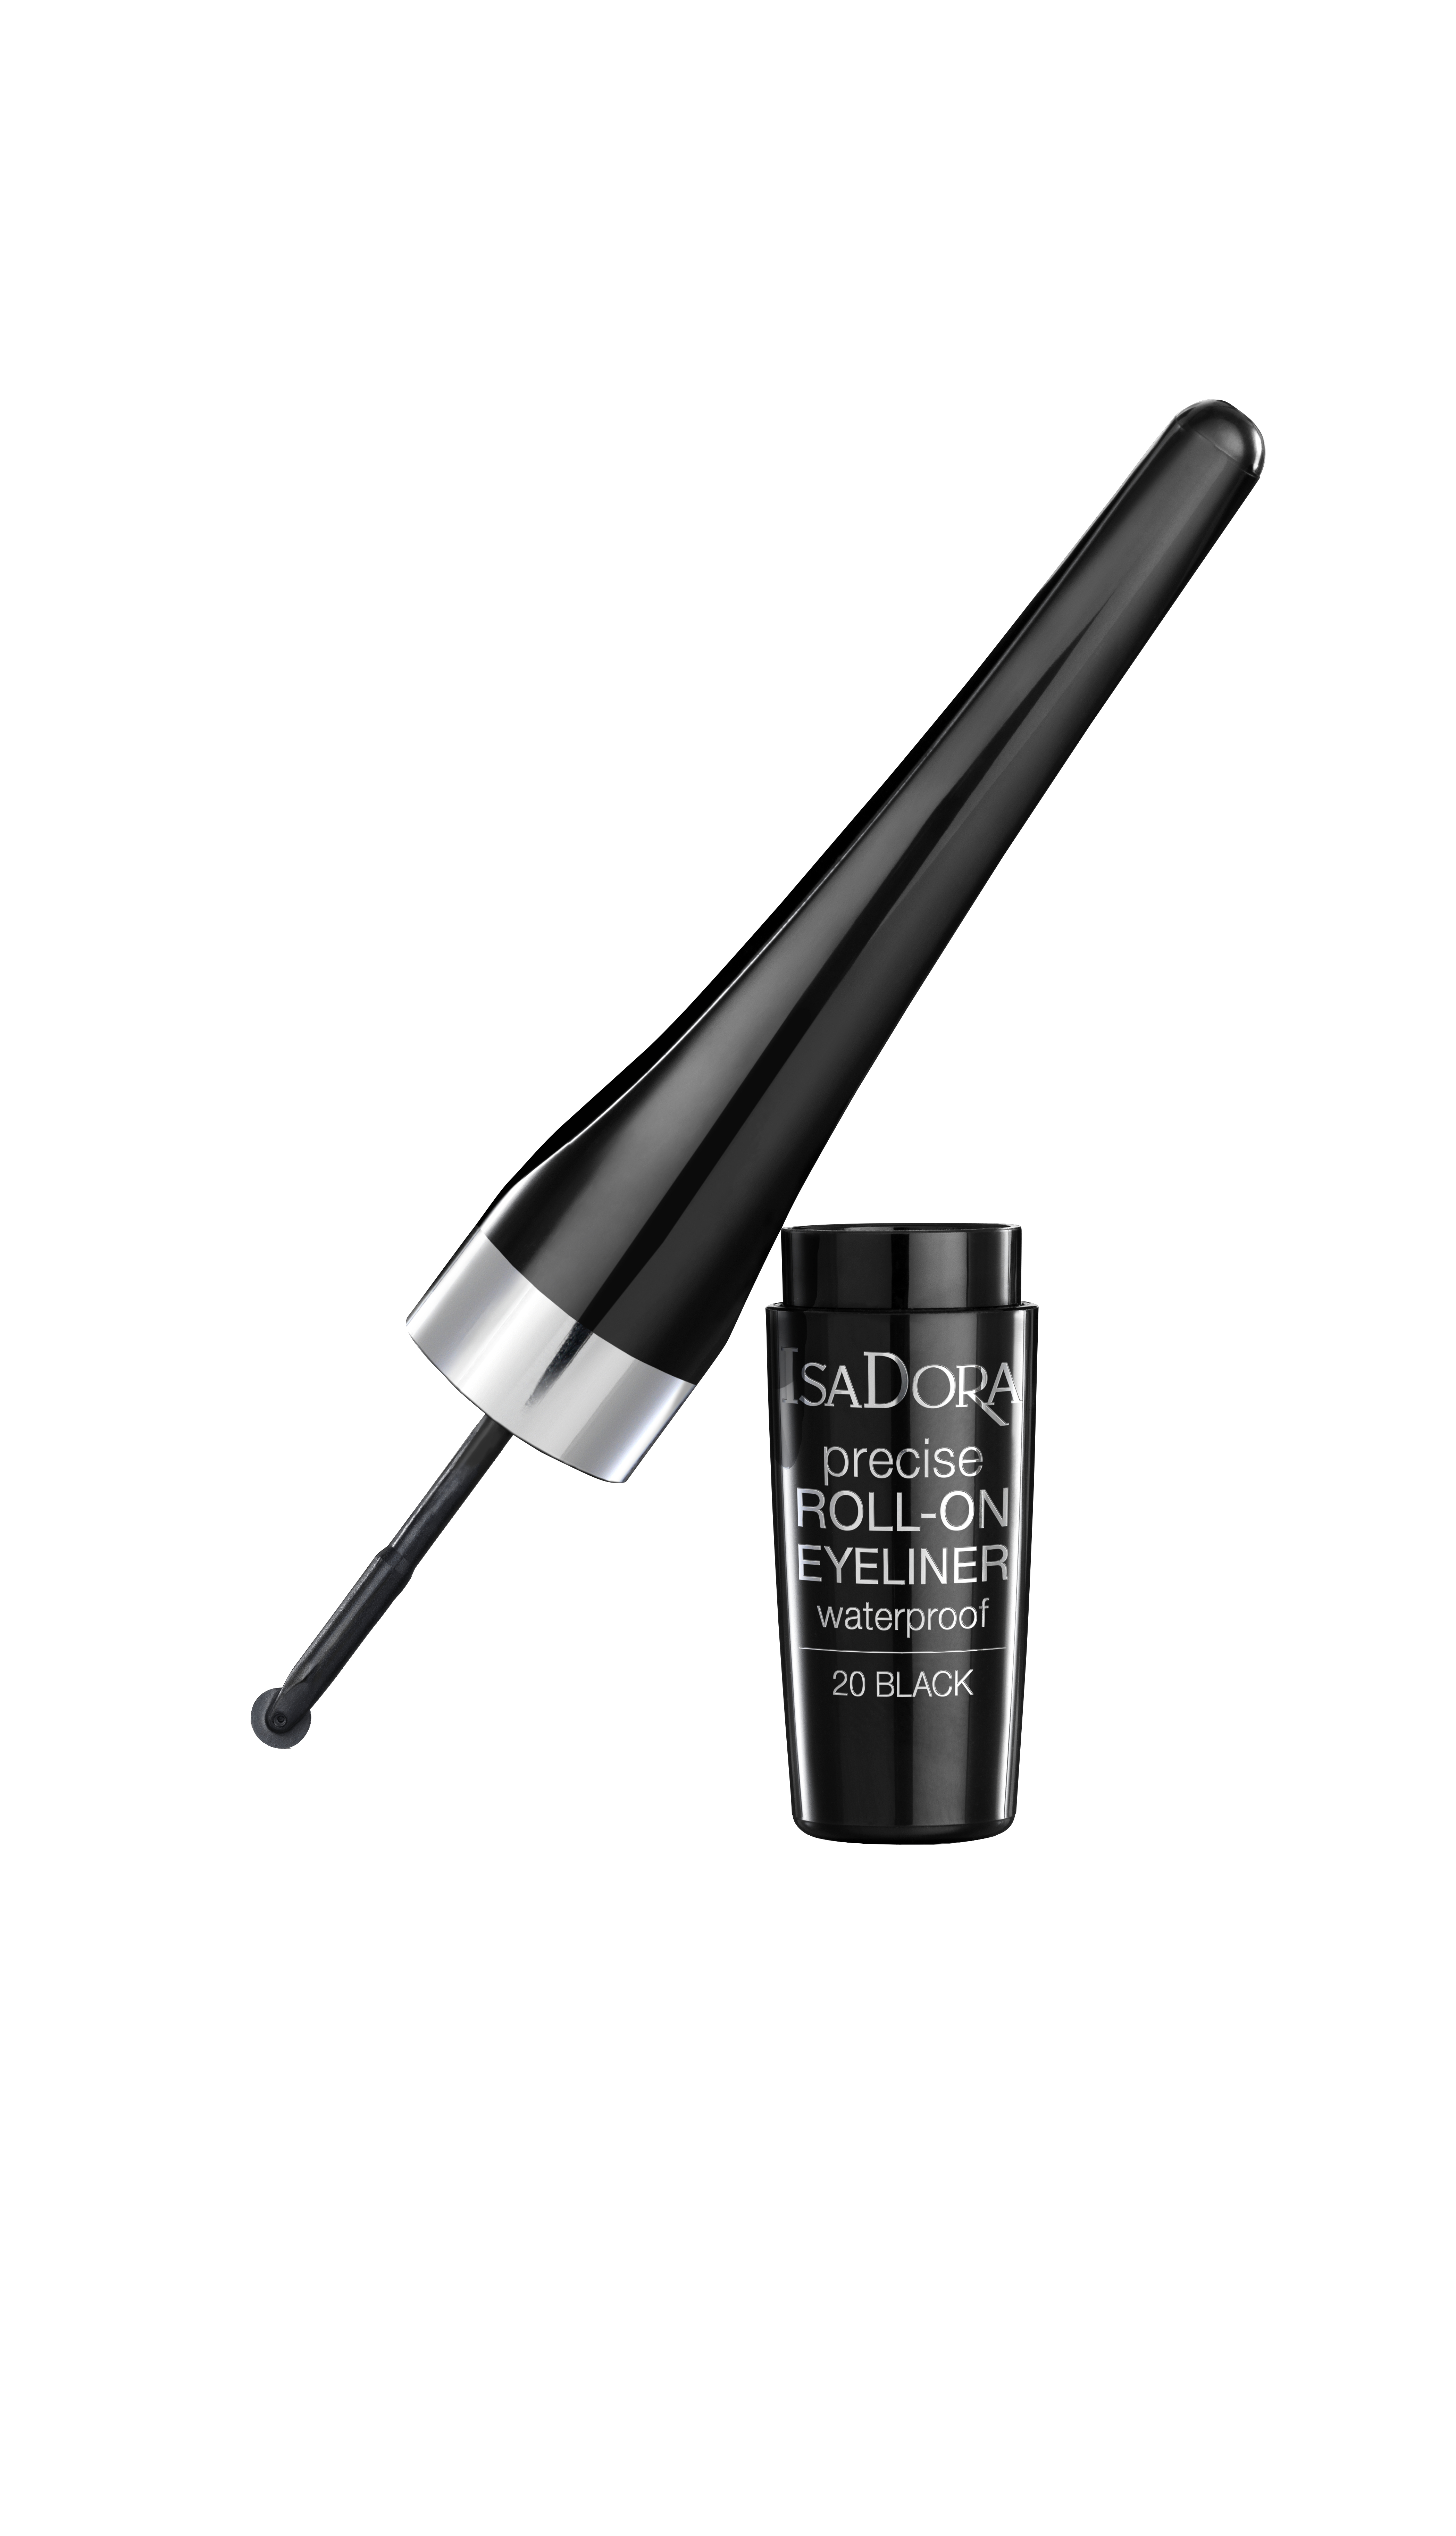 IsaDora - Precise Roll-On Eyeliner - Black